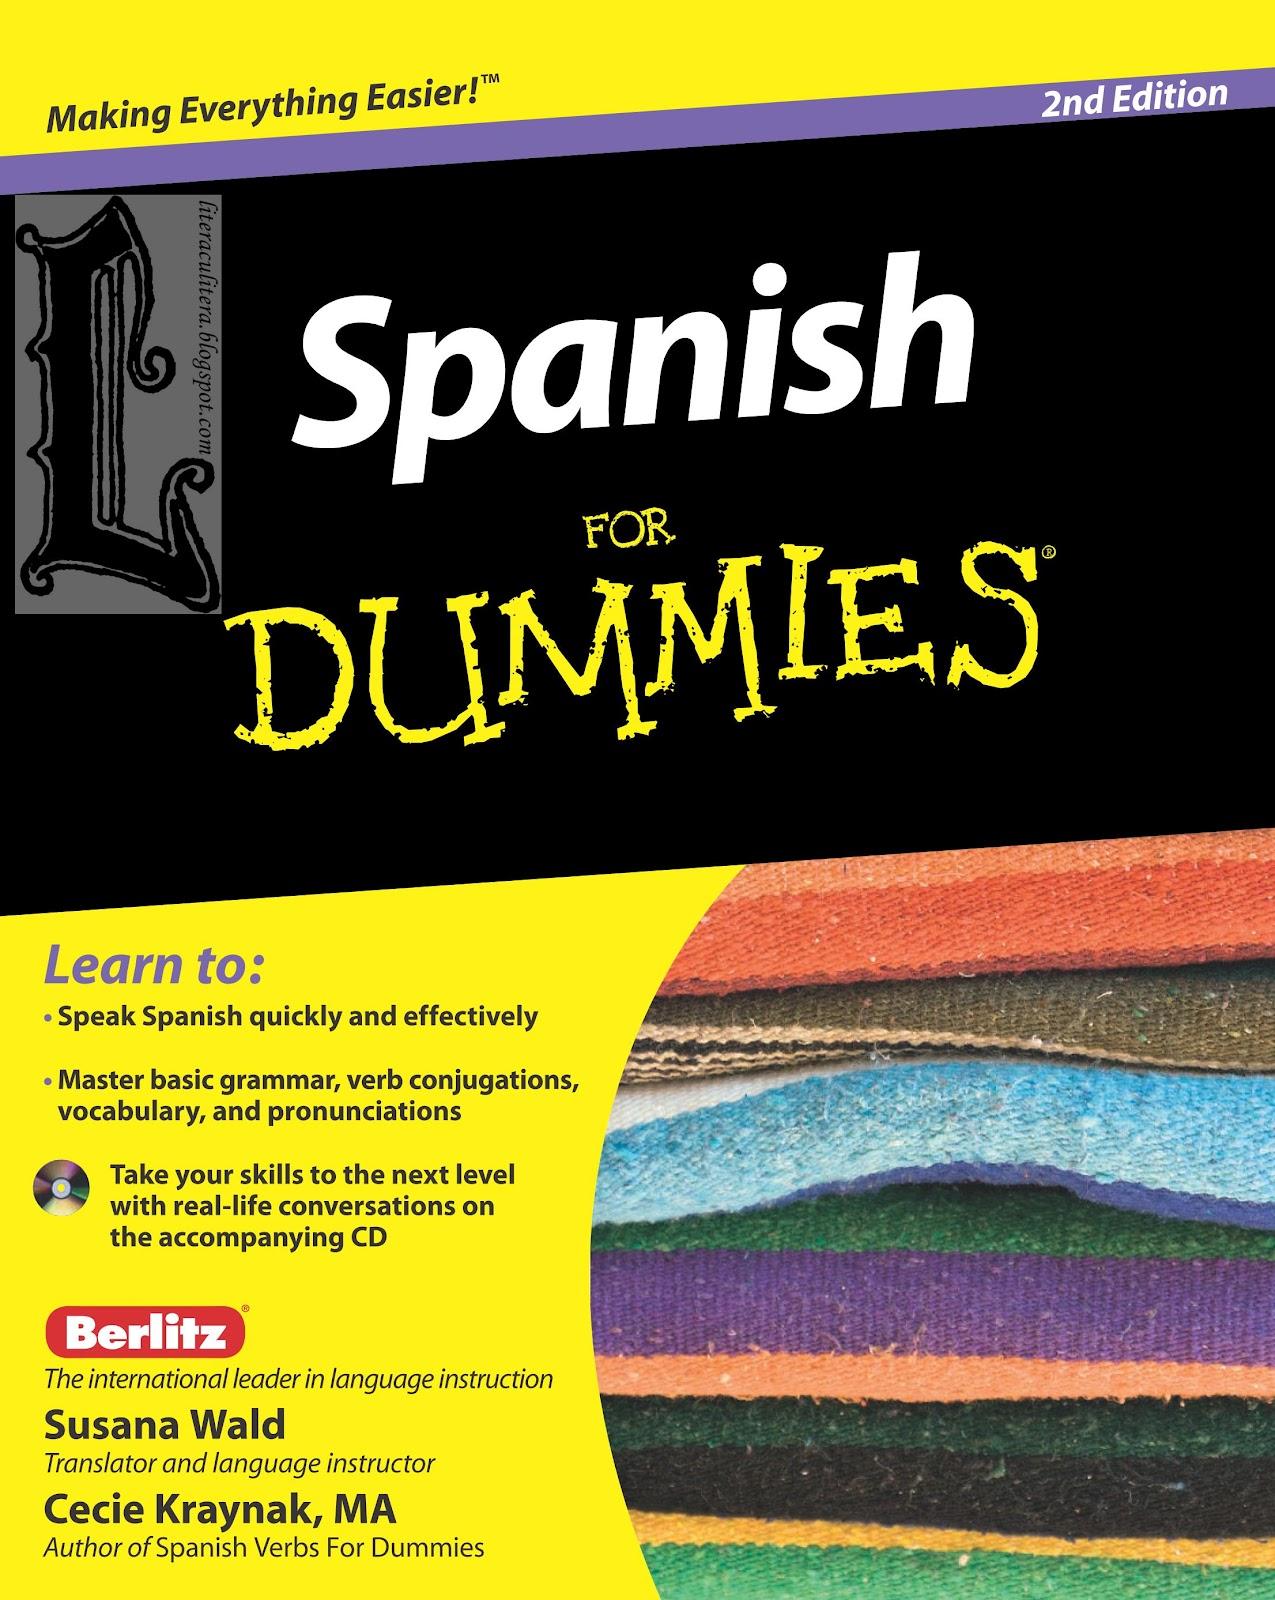 Spanish 1 Second Edition Student Textbook 2010 BJU Press 9781606820612